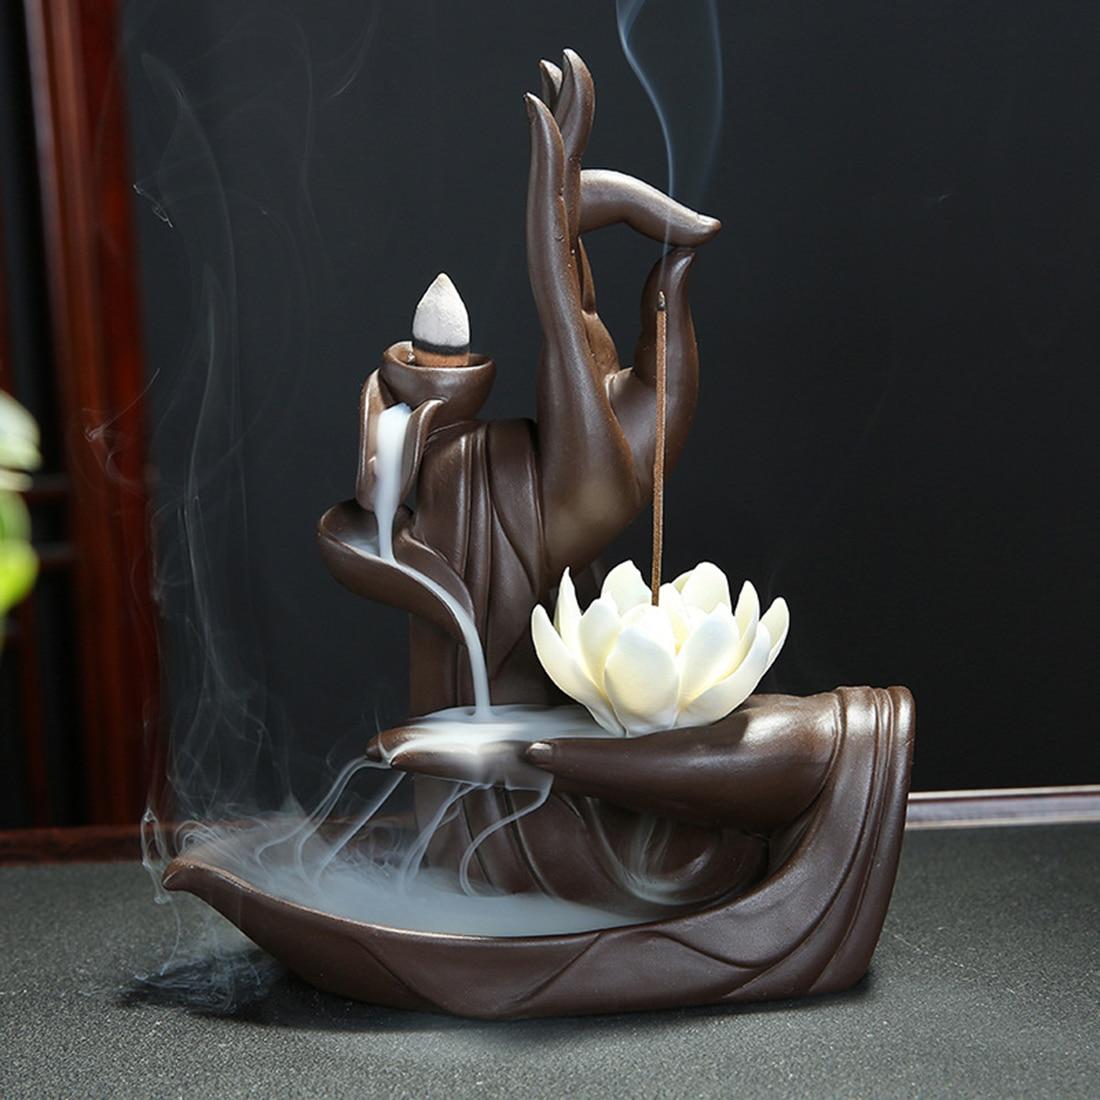 Ceramic Backflow Incense Burner Tathagata Buddha Lotus Incense Cones Stick Holder +10pc Cone Incense Creative Home Bouddha Decor vase